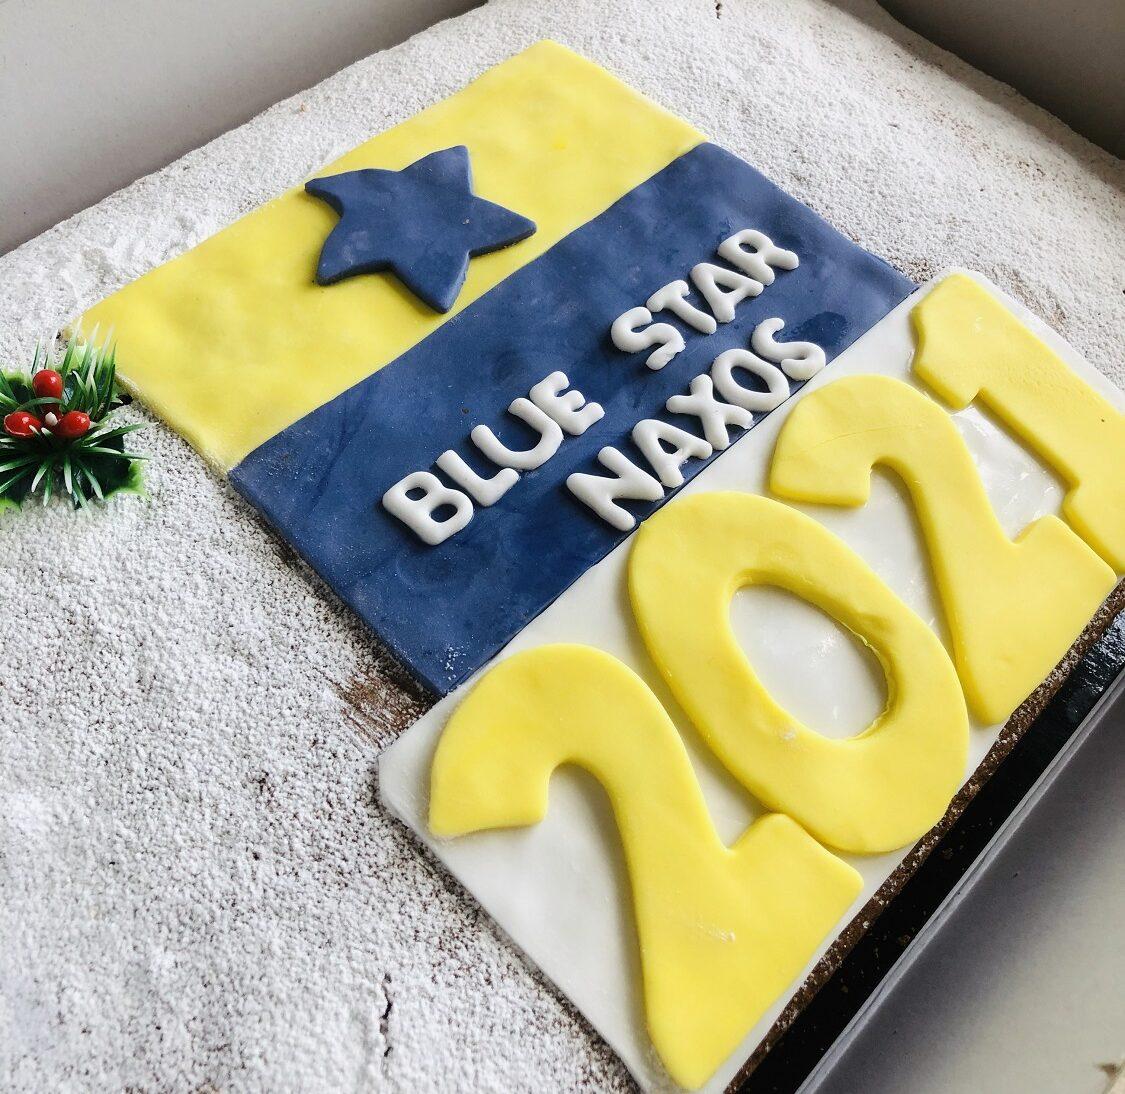 Blue Star Naxoς